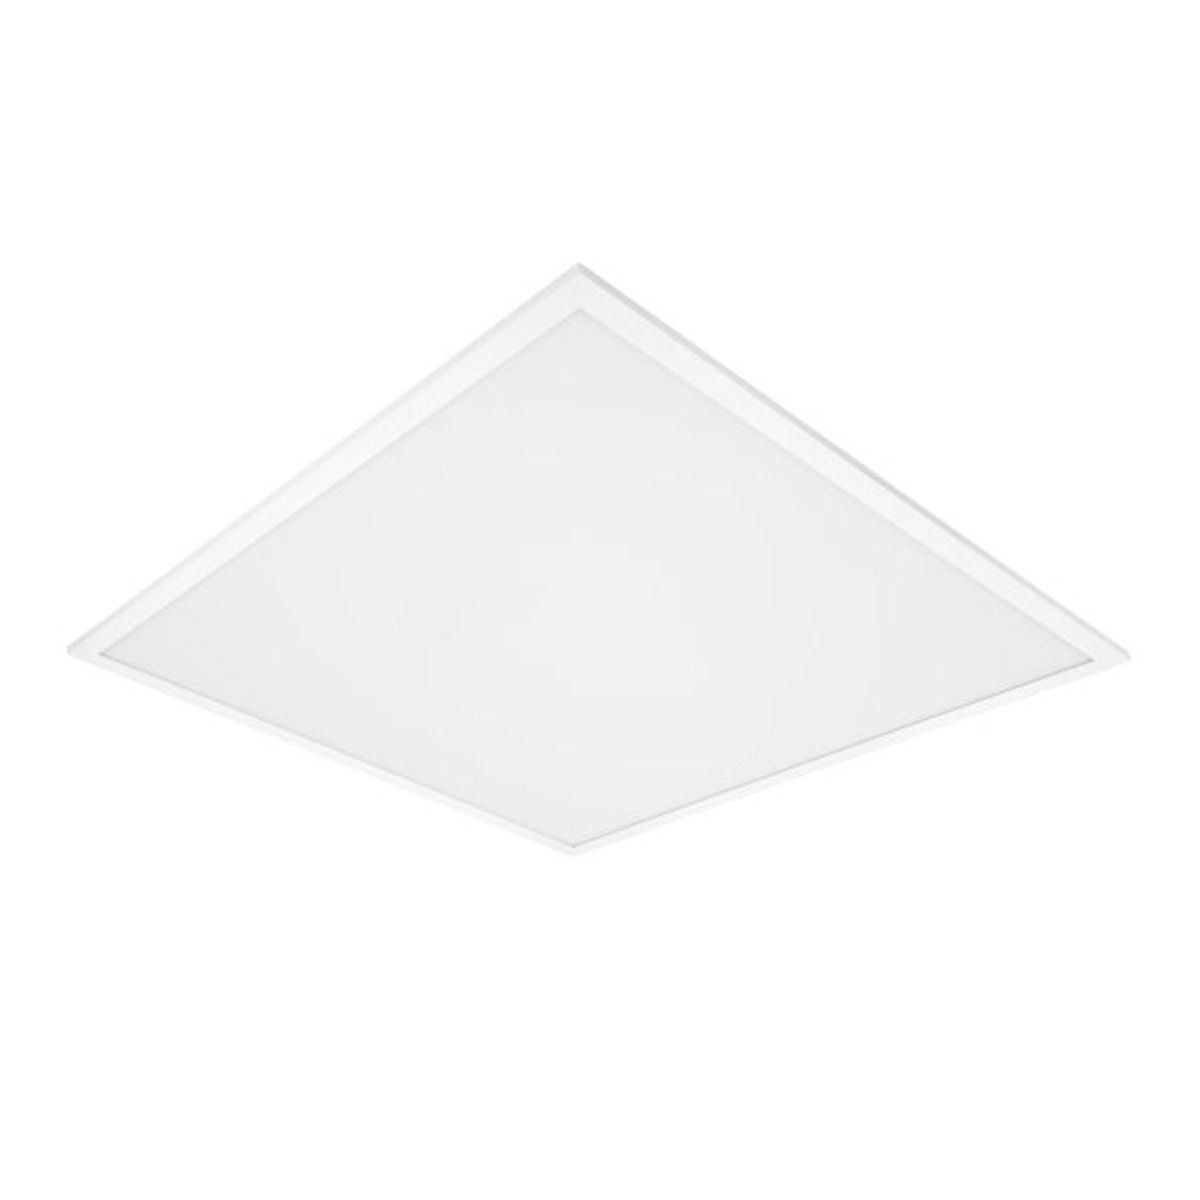 Ledvance LED Panel 62.5x62.5cm 4000K 36W IP54 | Dali Dimmbar - Kaltweiß - Ersatz für 4x18W